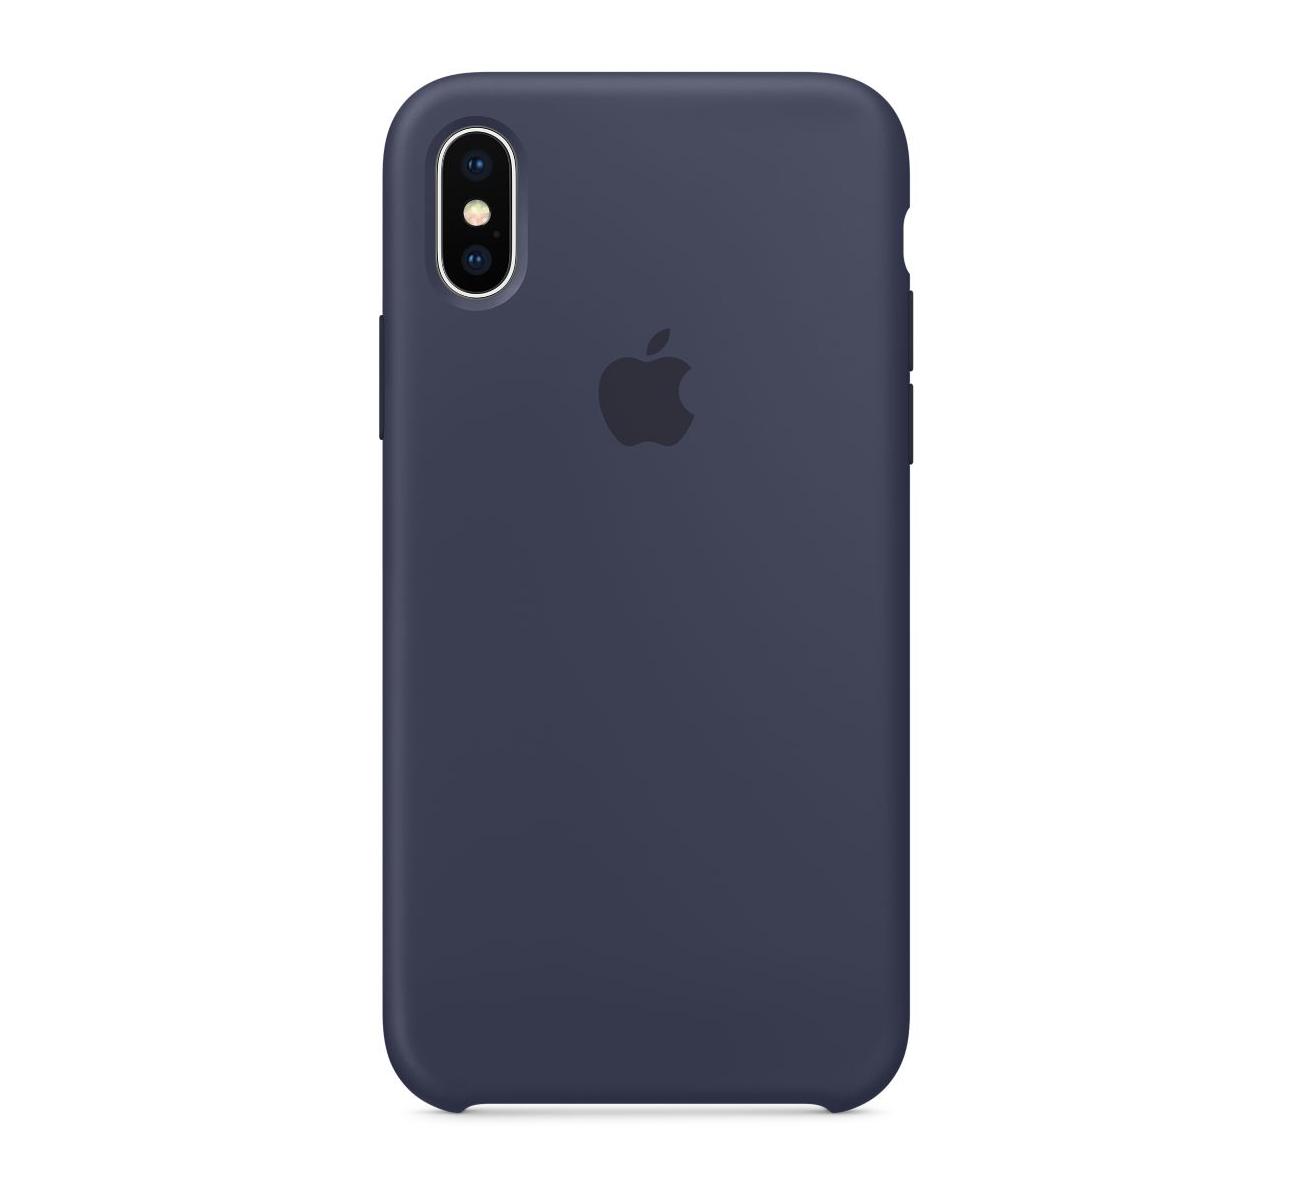 Apple silikónový obal pre iPhone XS Max – modrý 1